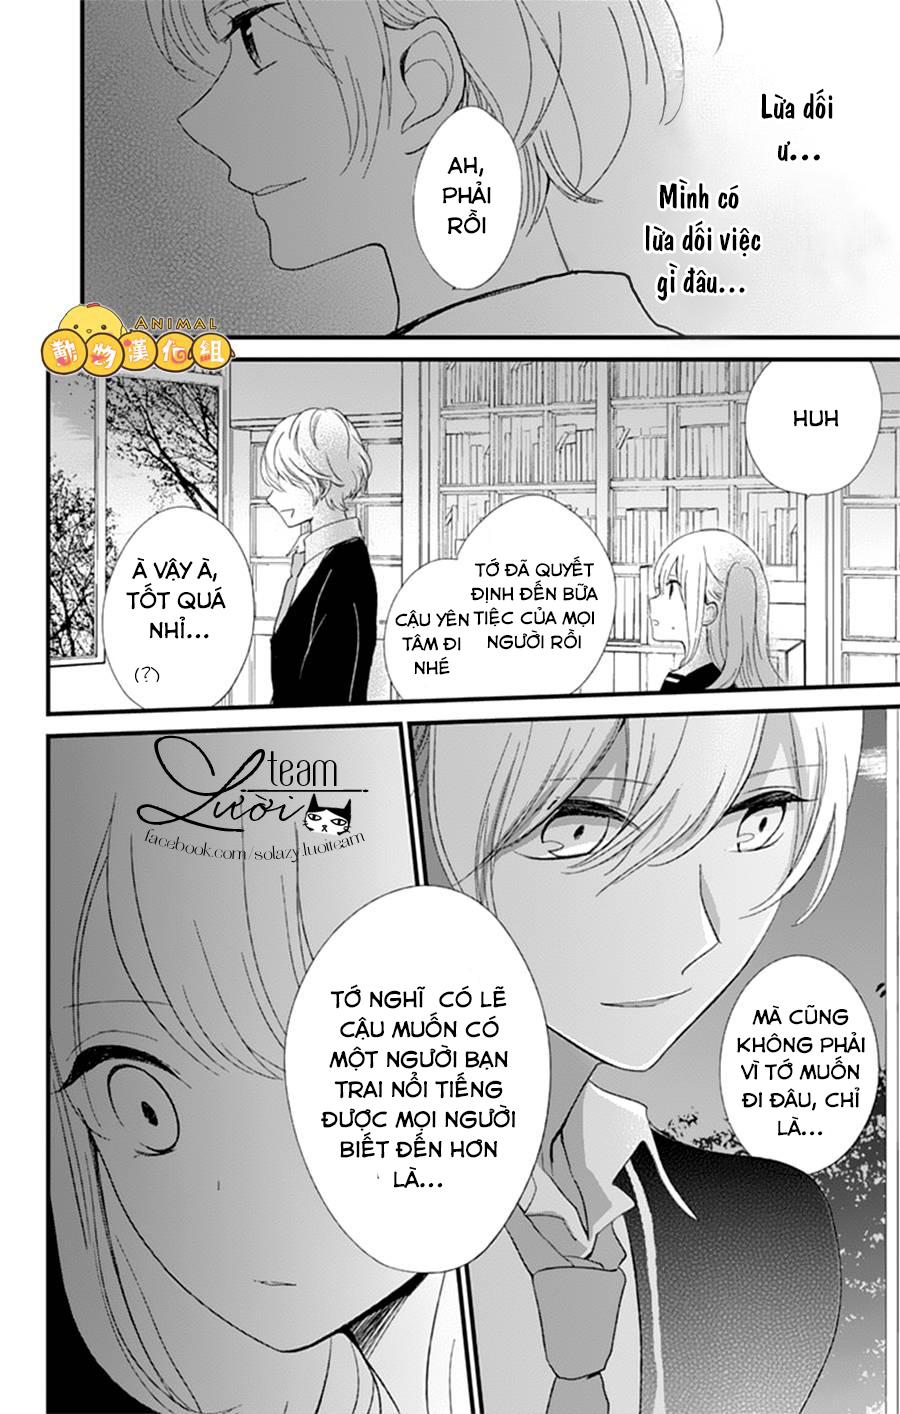 Kimi wa nani mo shiranai - chapter 8